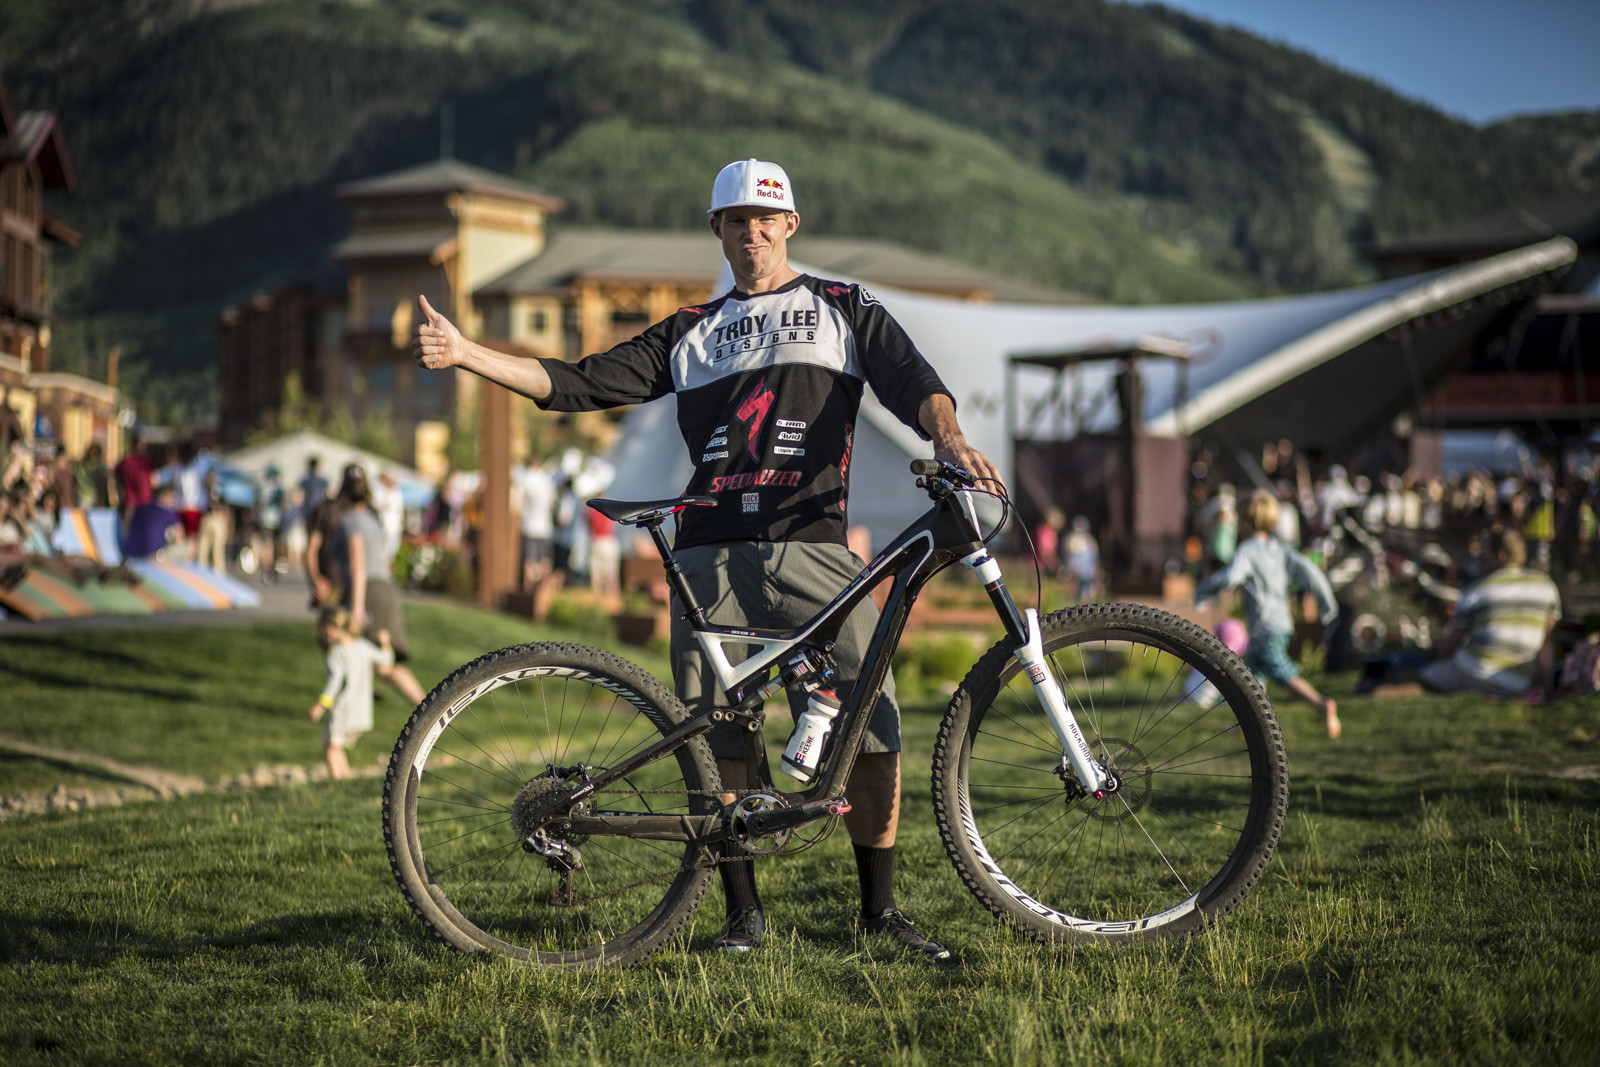 Winning Bike: Curtis Keene's Specialized Stumpjumper EVO 29 - Winning Bike: Curtis Keene's Specialized Stumpjumper EVO 29 - Mountain Biking Pictures - Vital MTB